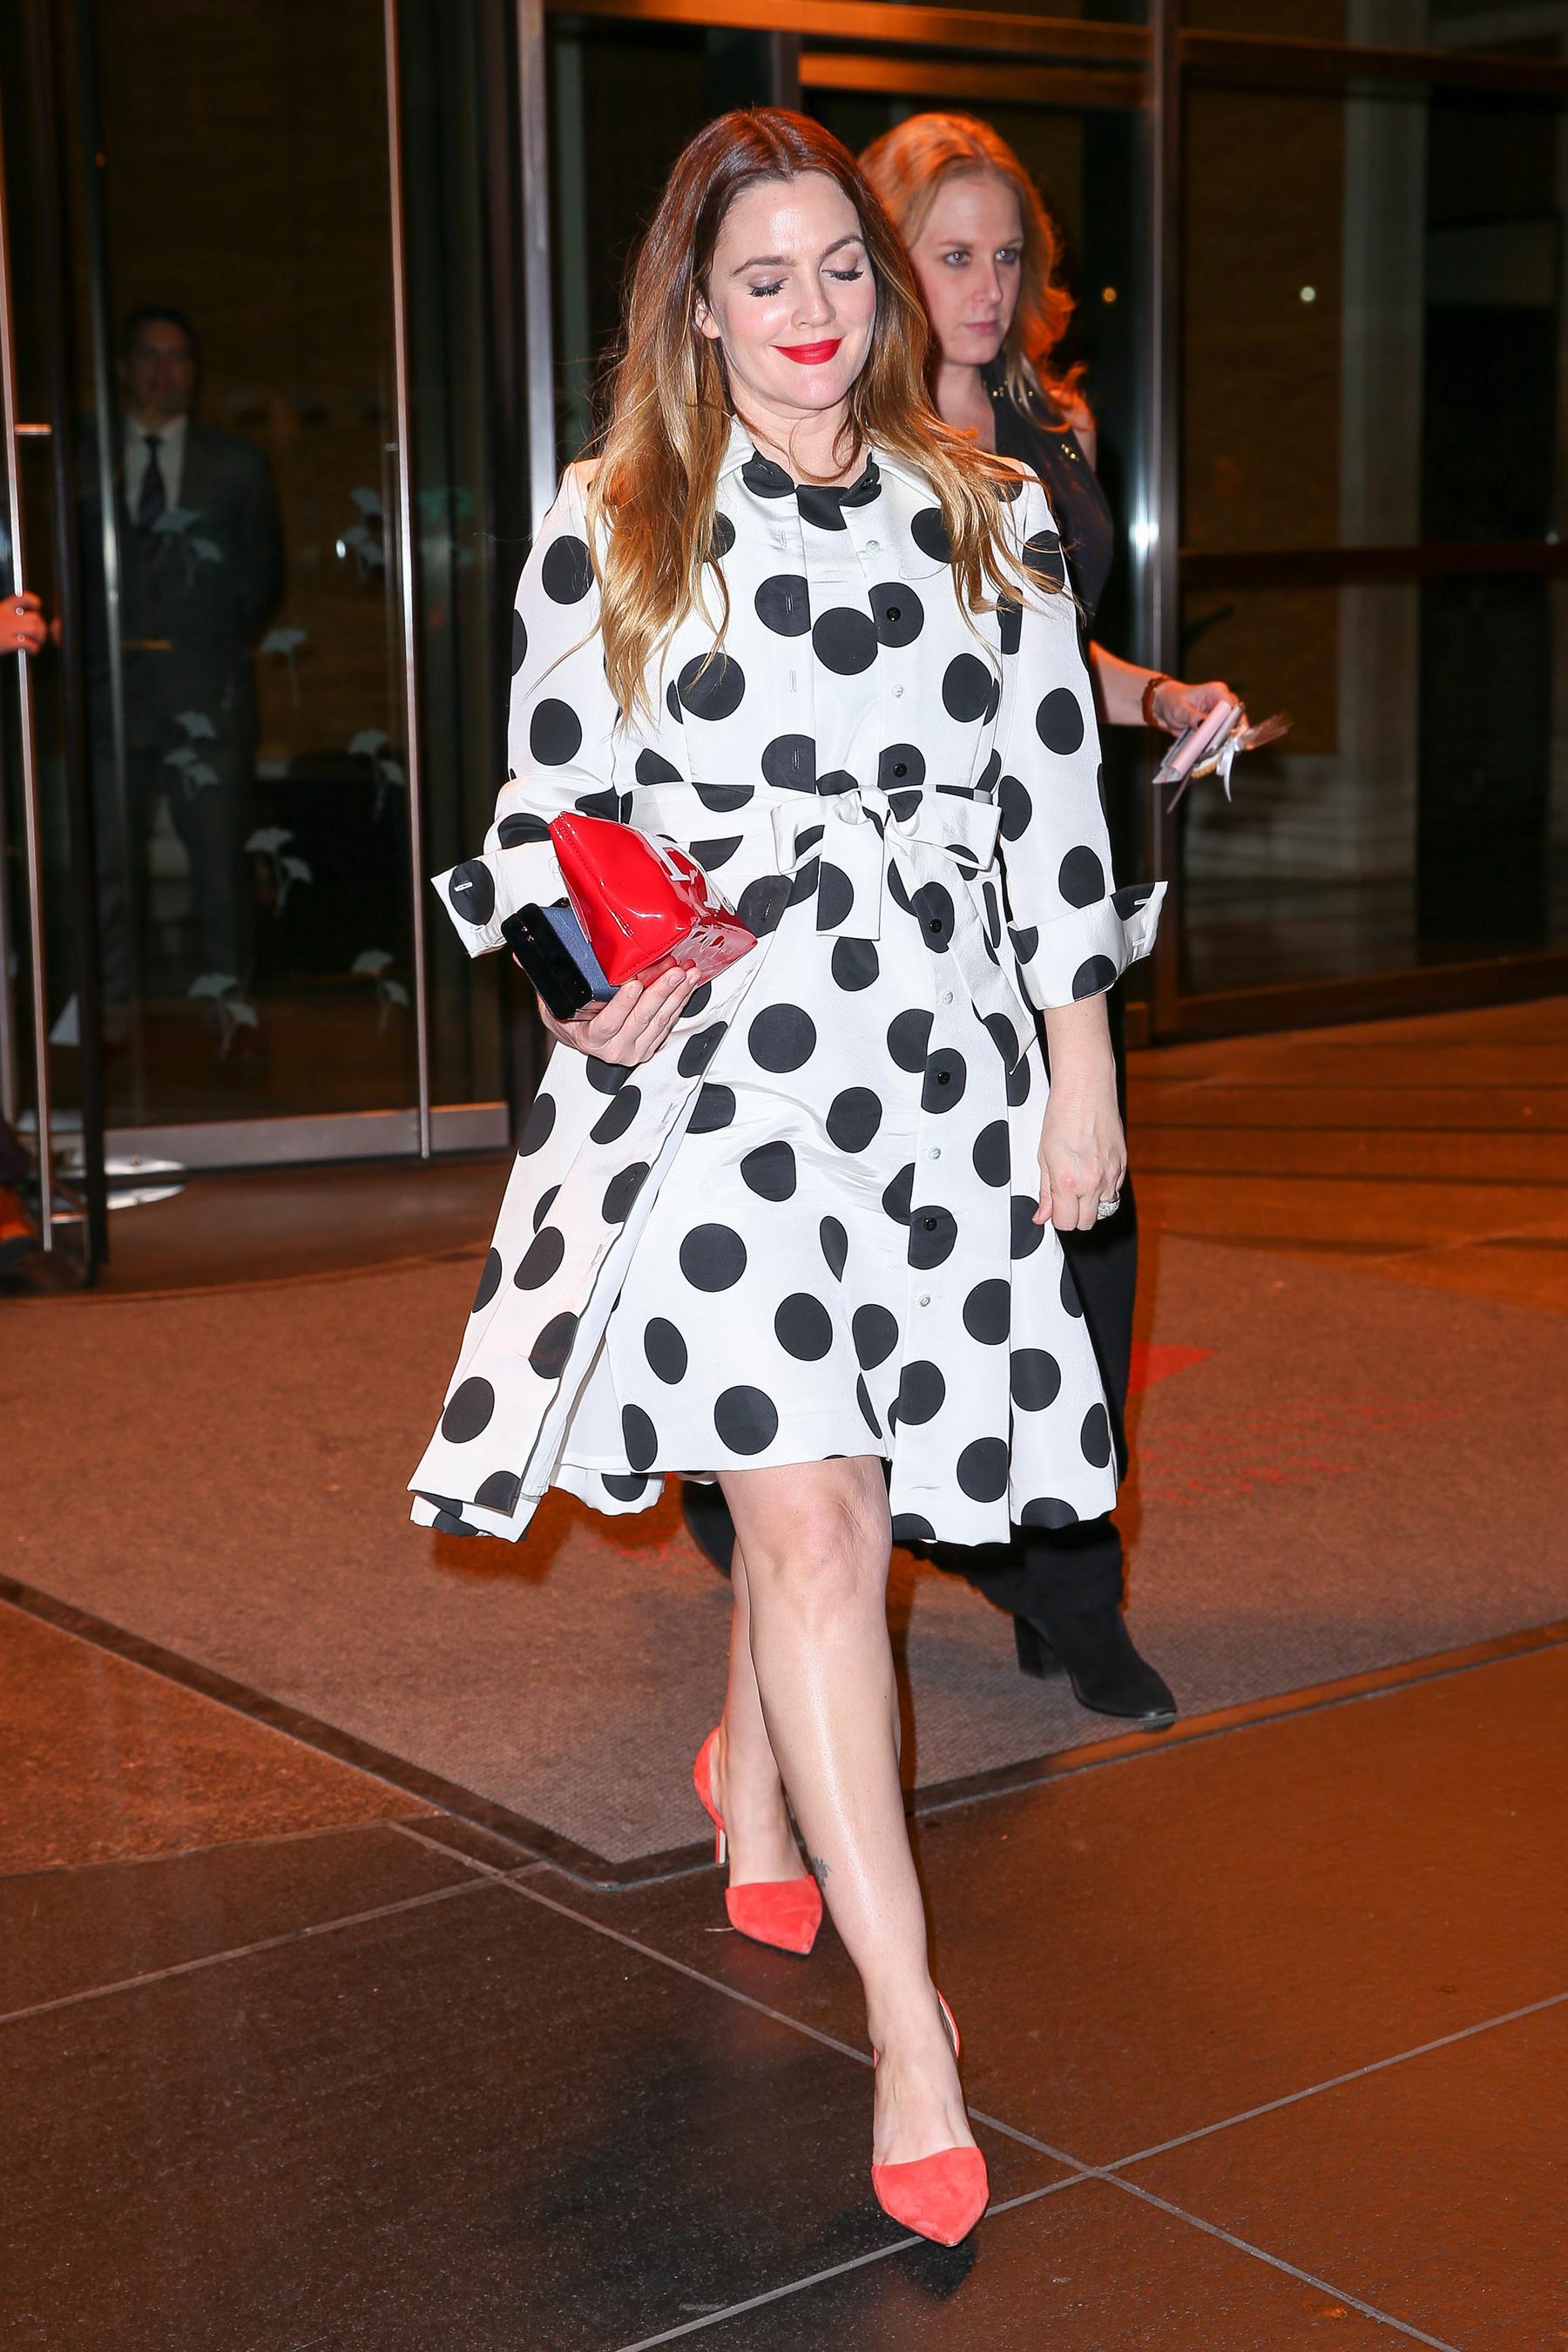 Drew Barrymore in New York City Jan-4